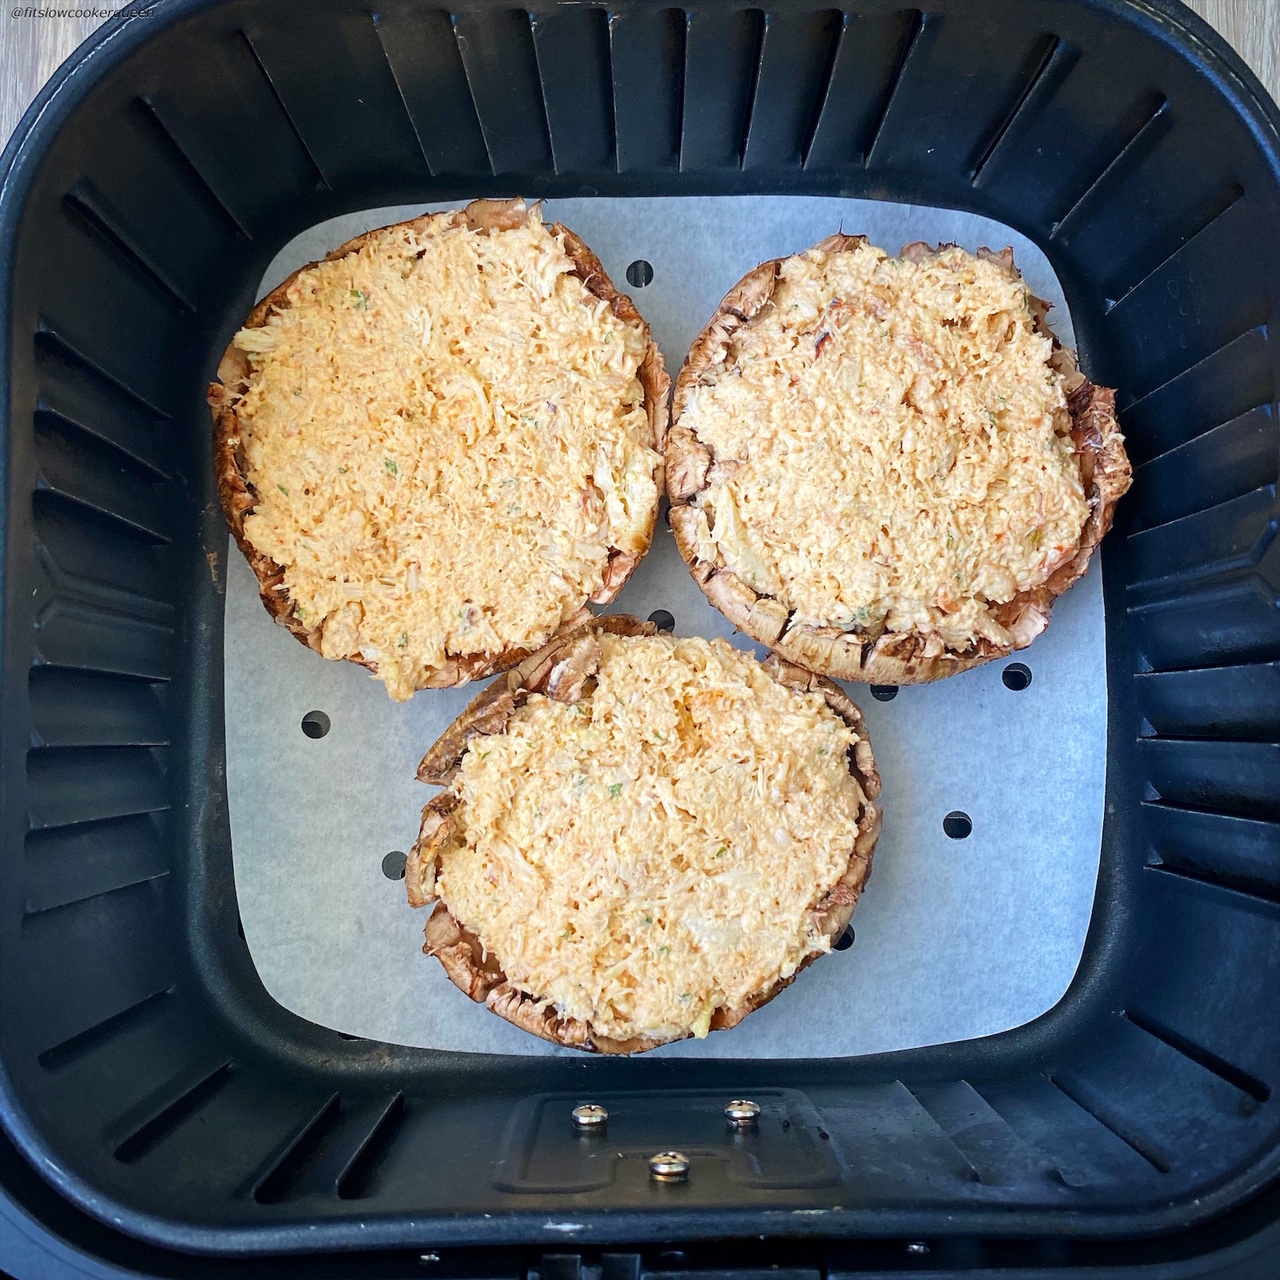 3 large portobello mushrooms in the air fryer